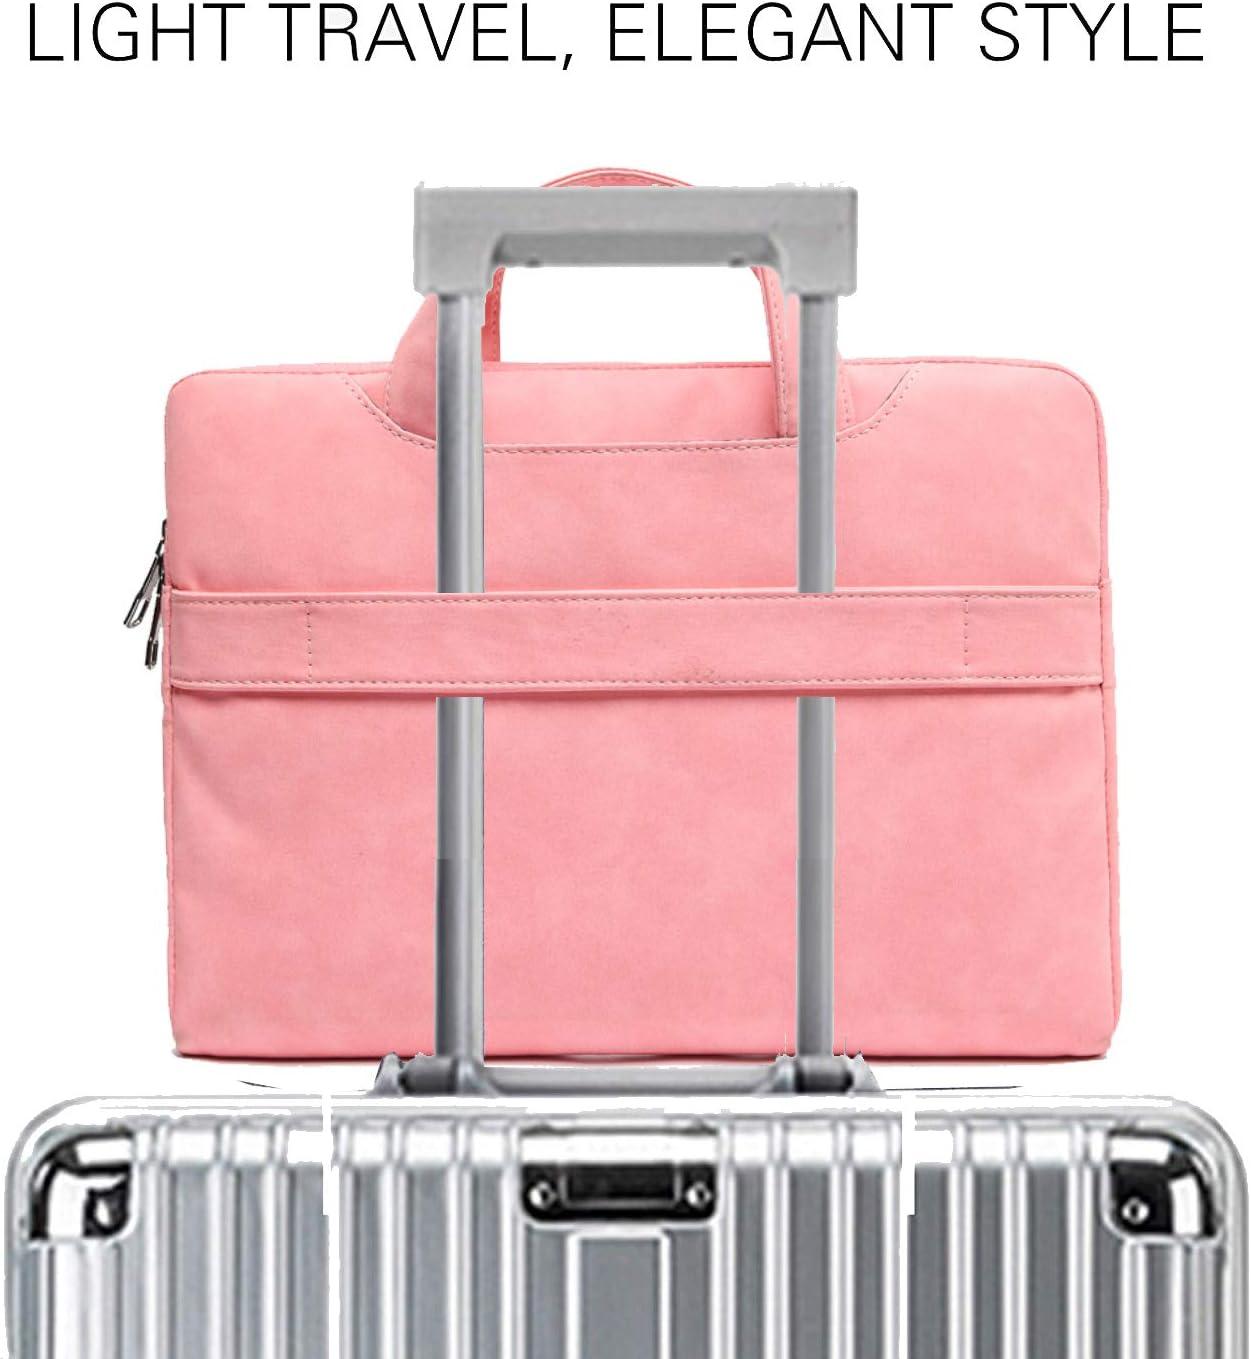 13.3 Inch Laptop Carrying Case for MacBook Pro 13 Computer Sleeve Grey Slim PU Leather Laptop Bag Large Briefcase Handbag for Women Men Waterproof Messenger Shoulder Bag for 12-13.3in Notebook